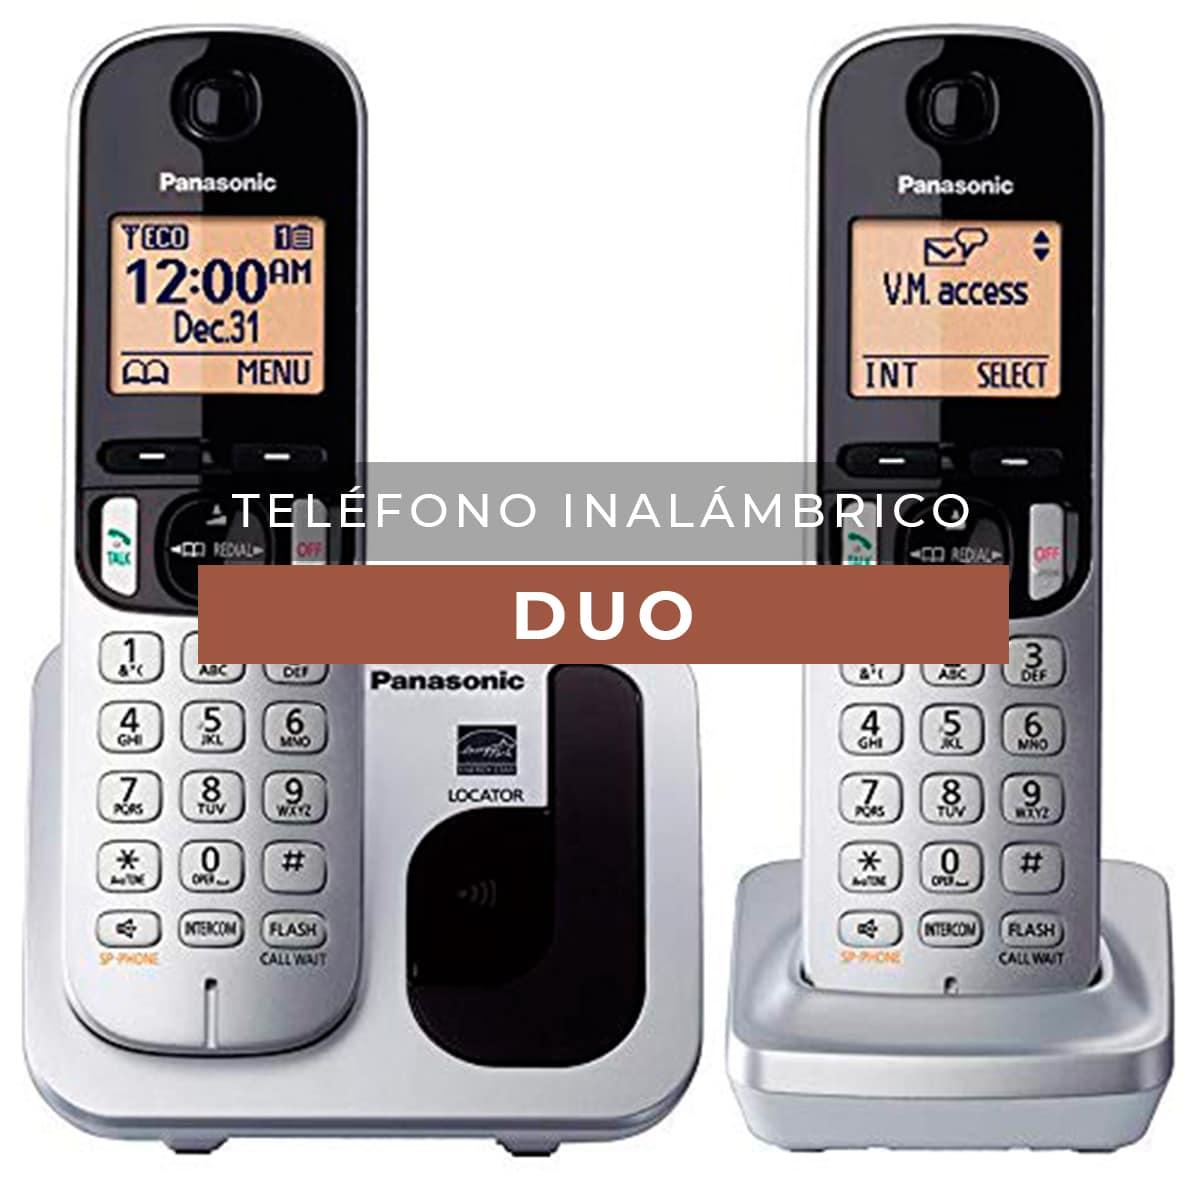 telefono inalambrico duo